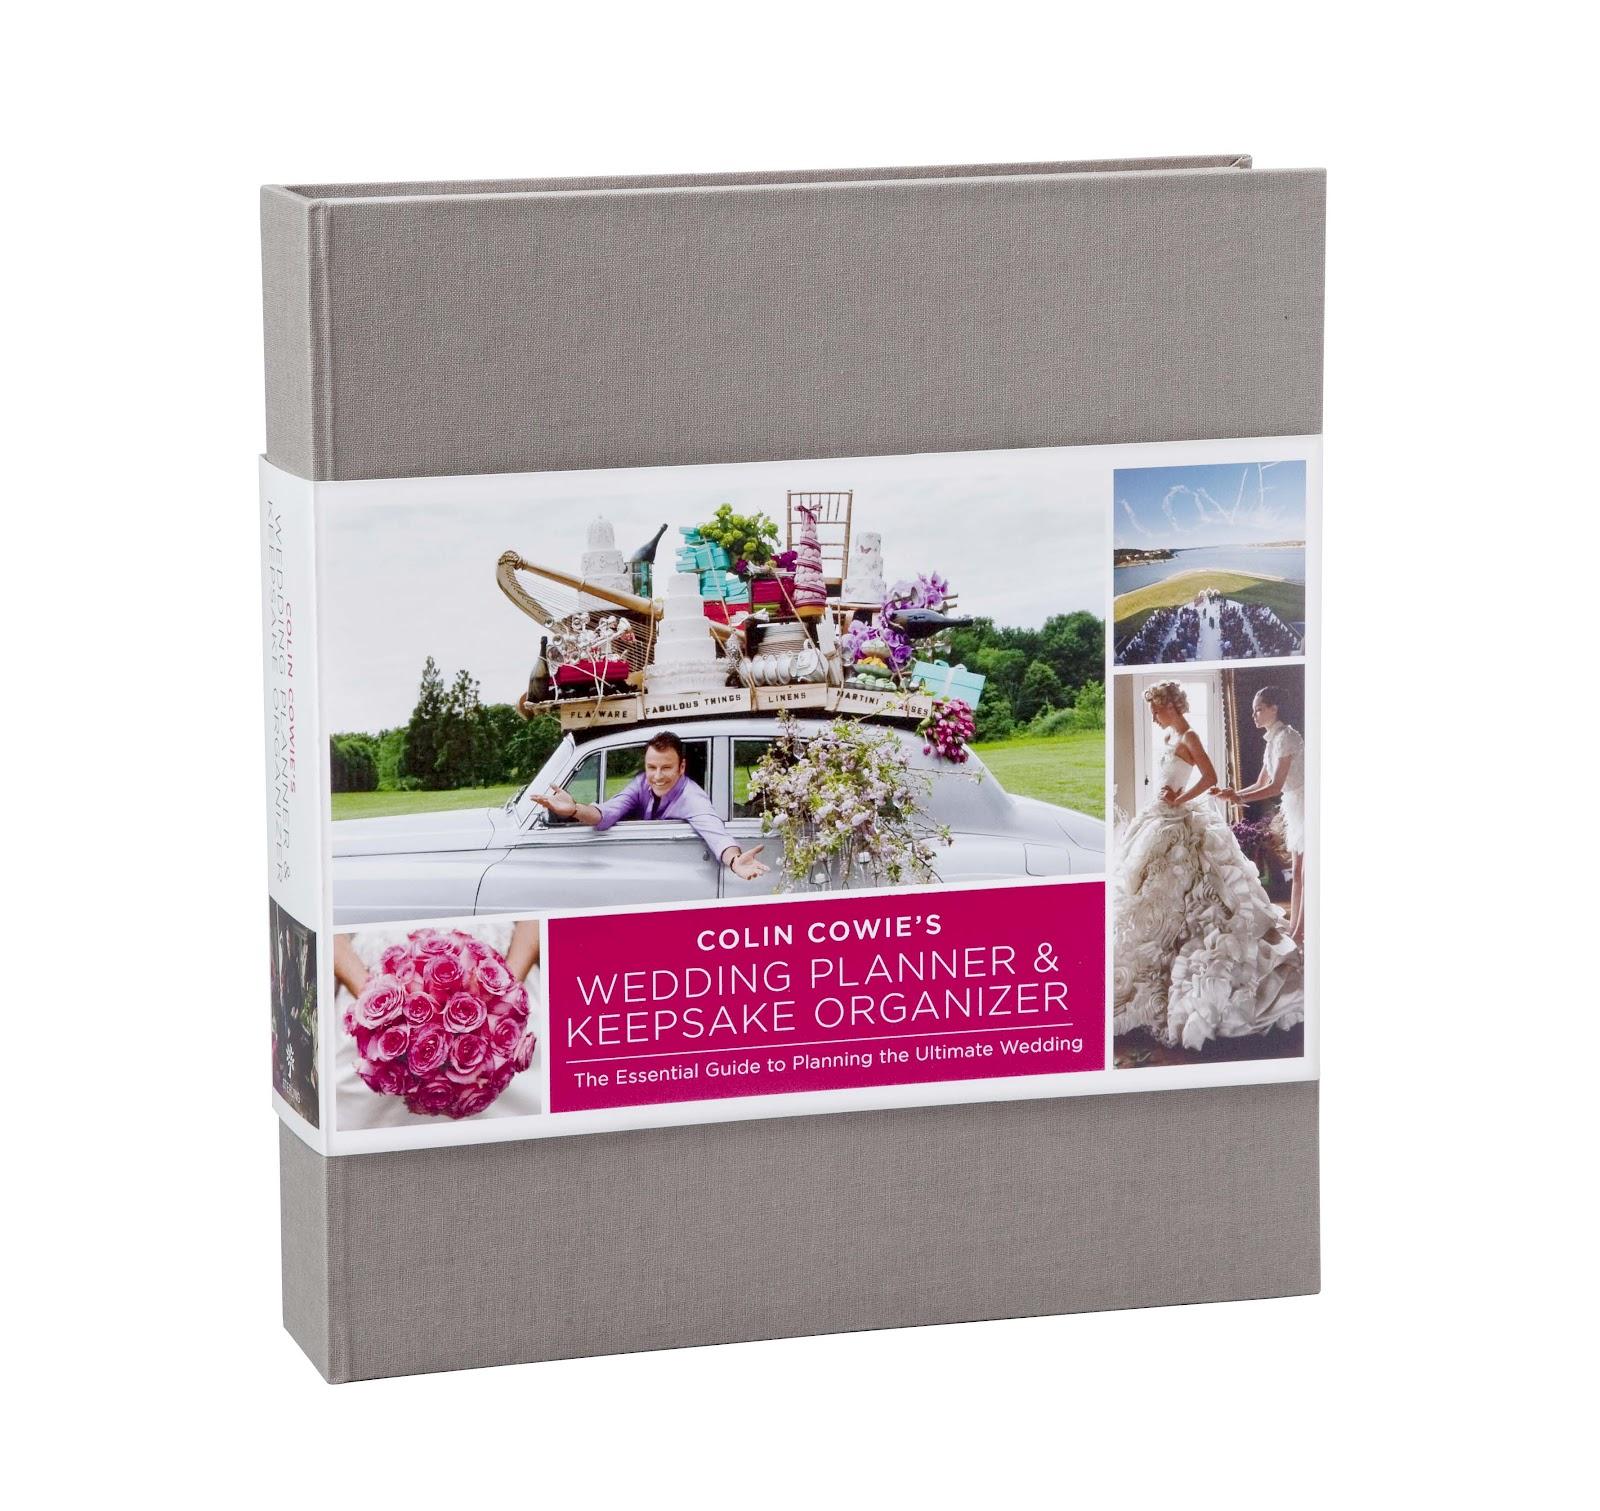 Destination weddings celebrity wedding planning guide for Destination wedding planning guide